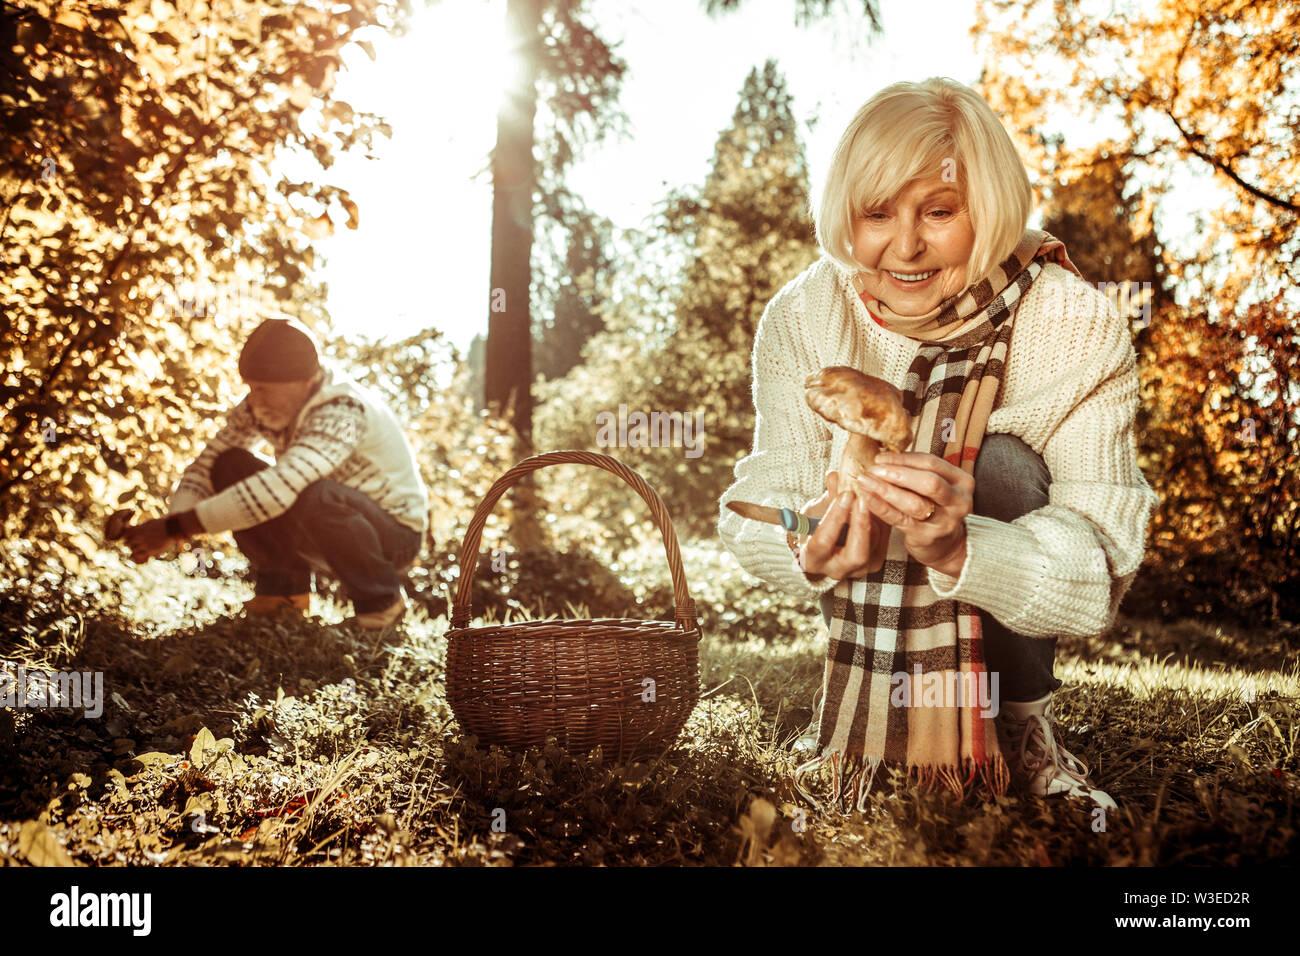 Happy woman holding un champignon en face de son mari. Photo Stock